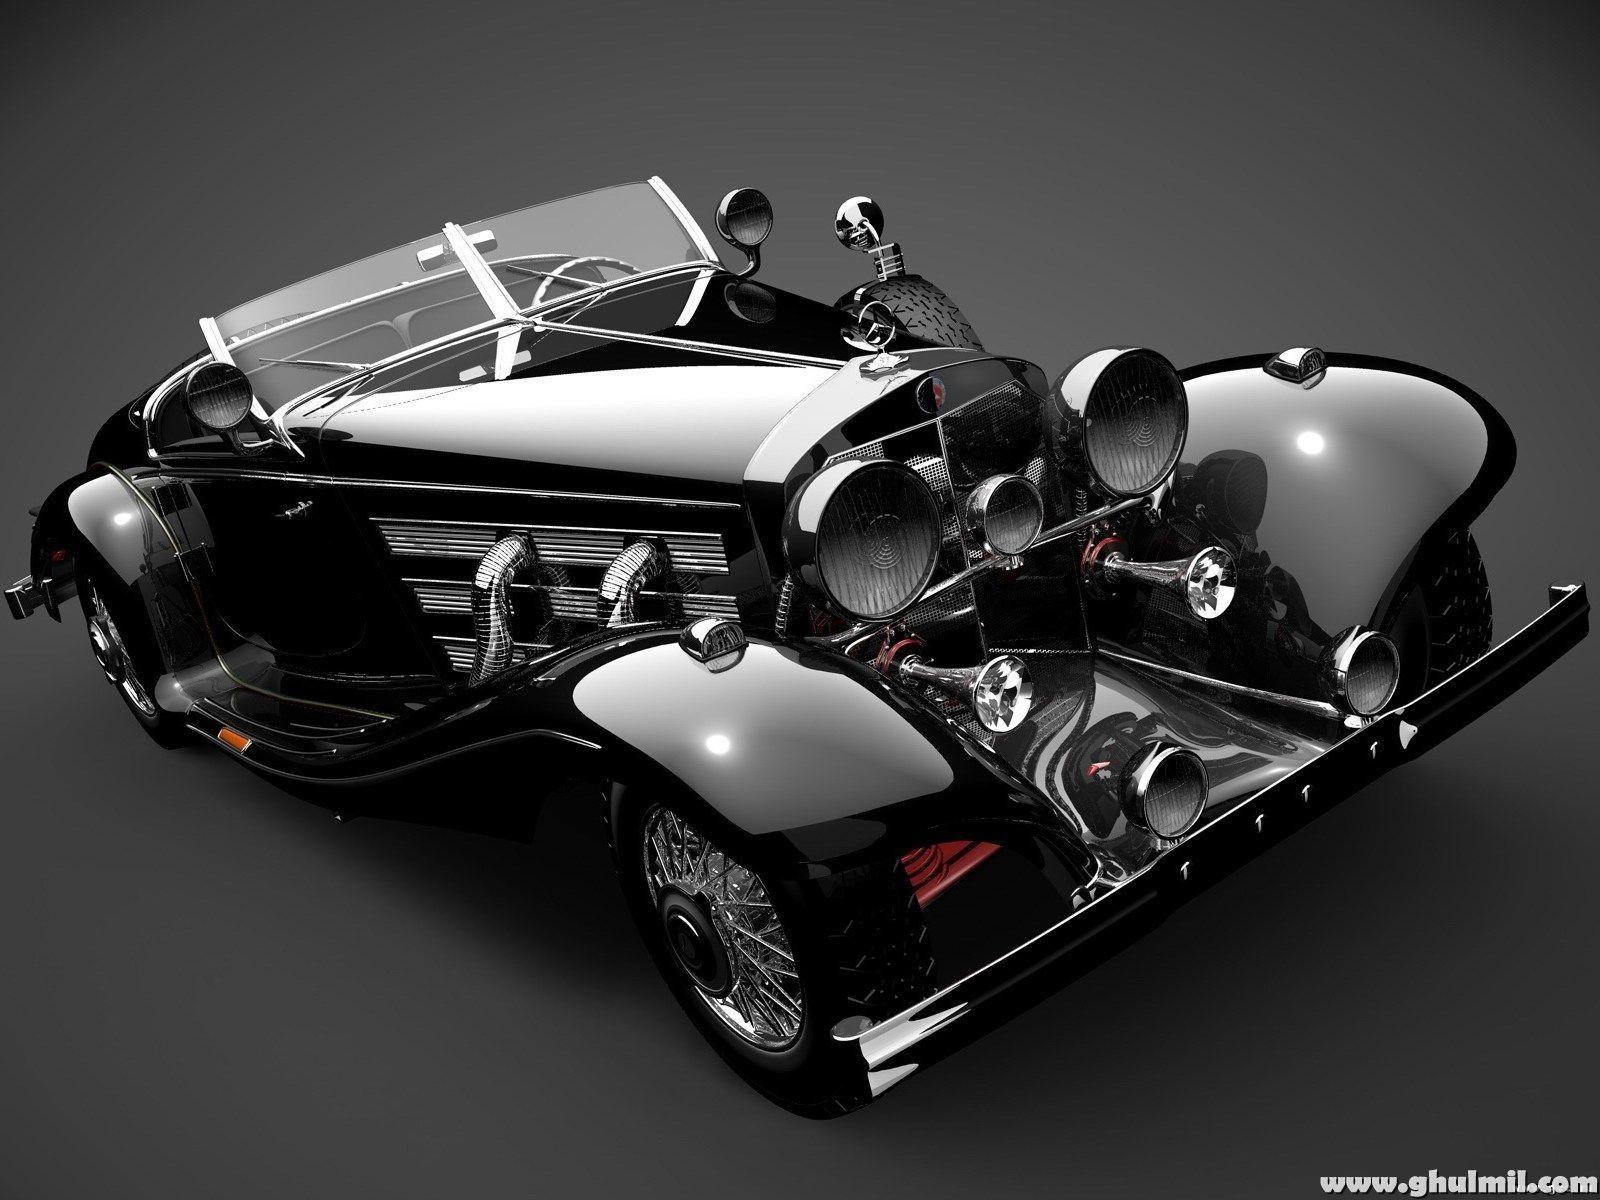 Muscle Cars Wallpaper Hd Pesquisa Google Hot Rod Cars